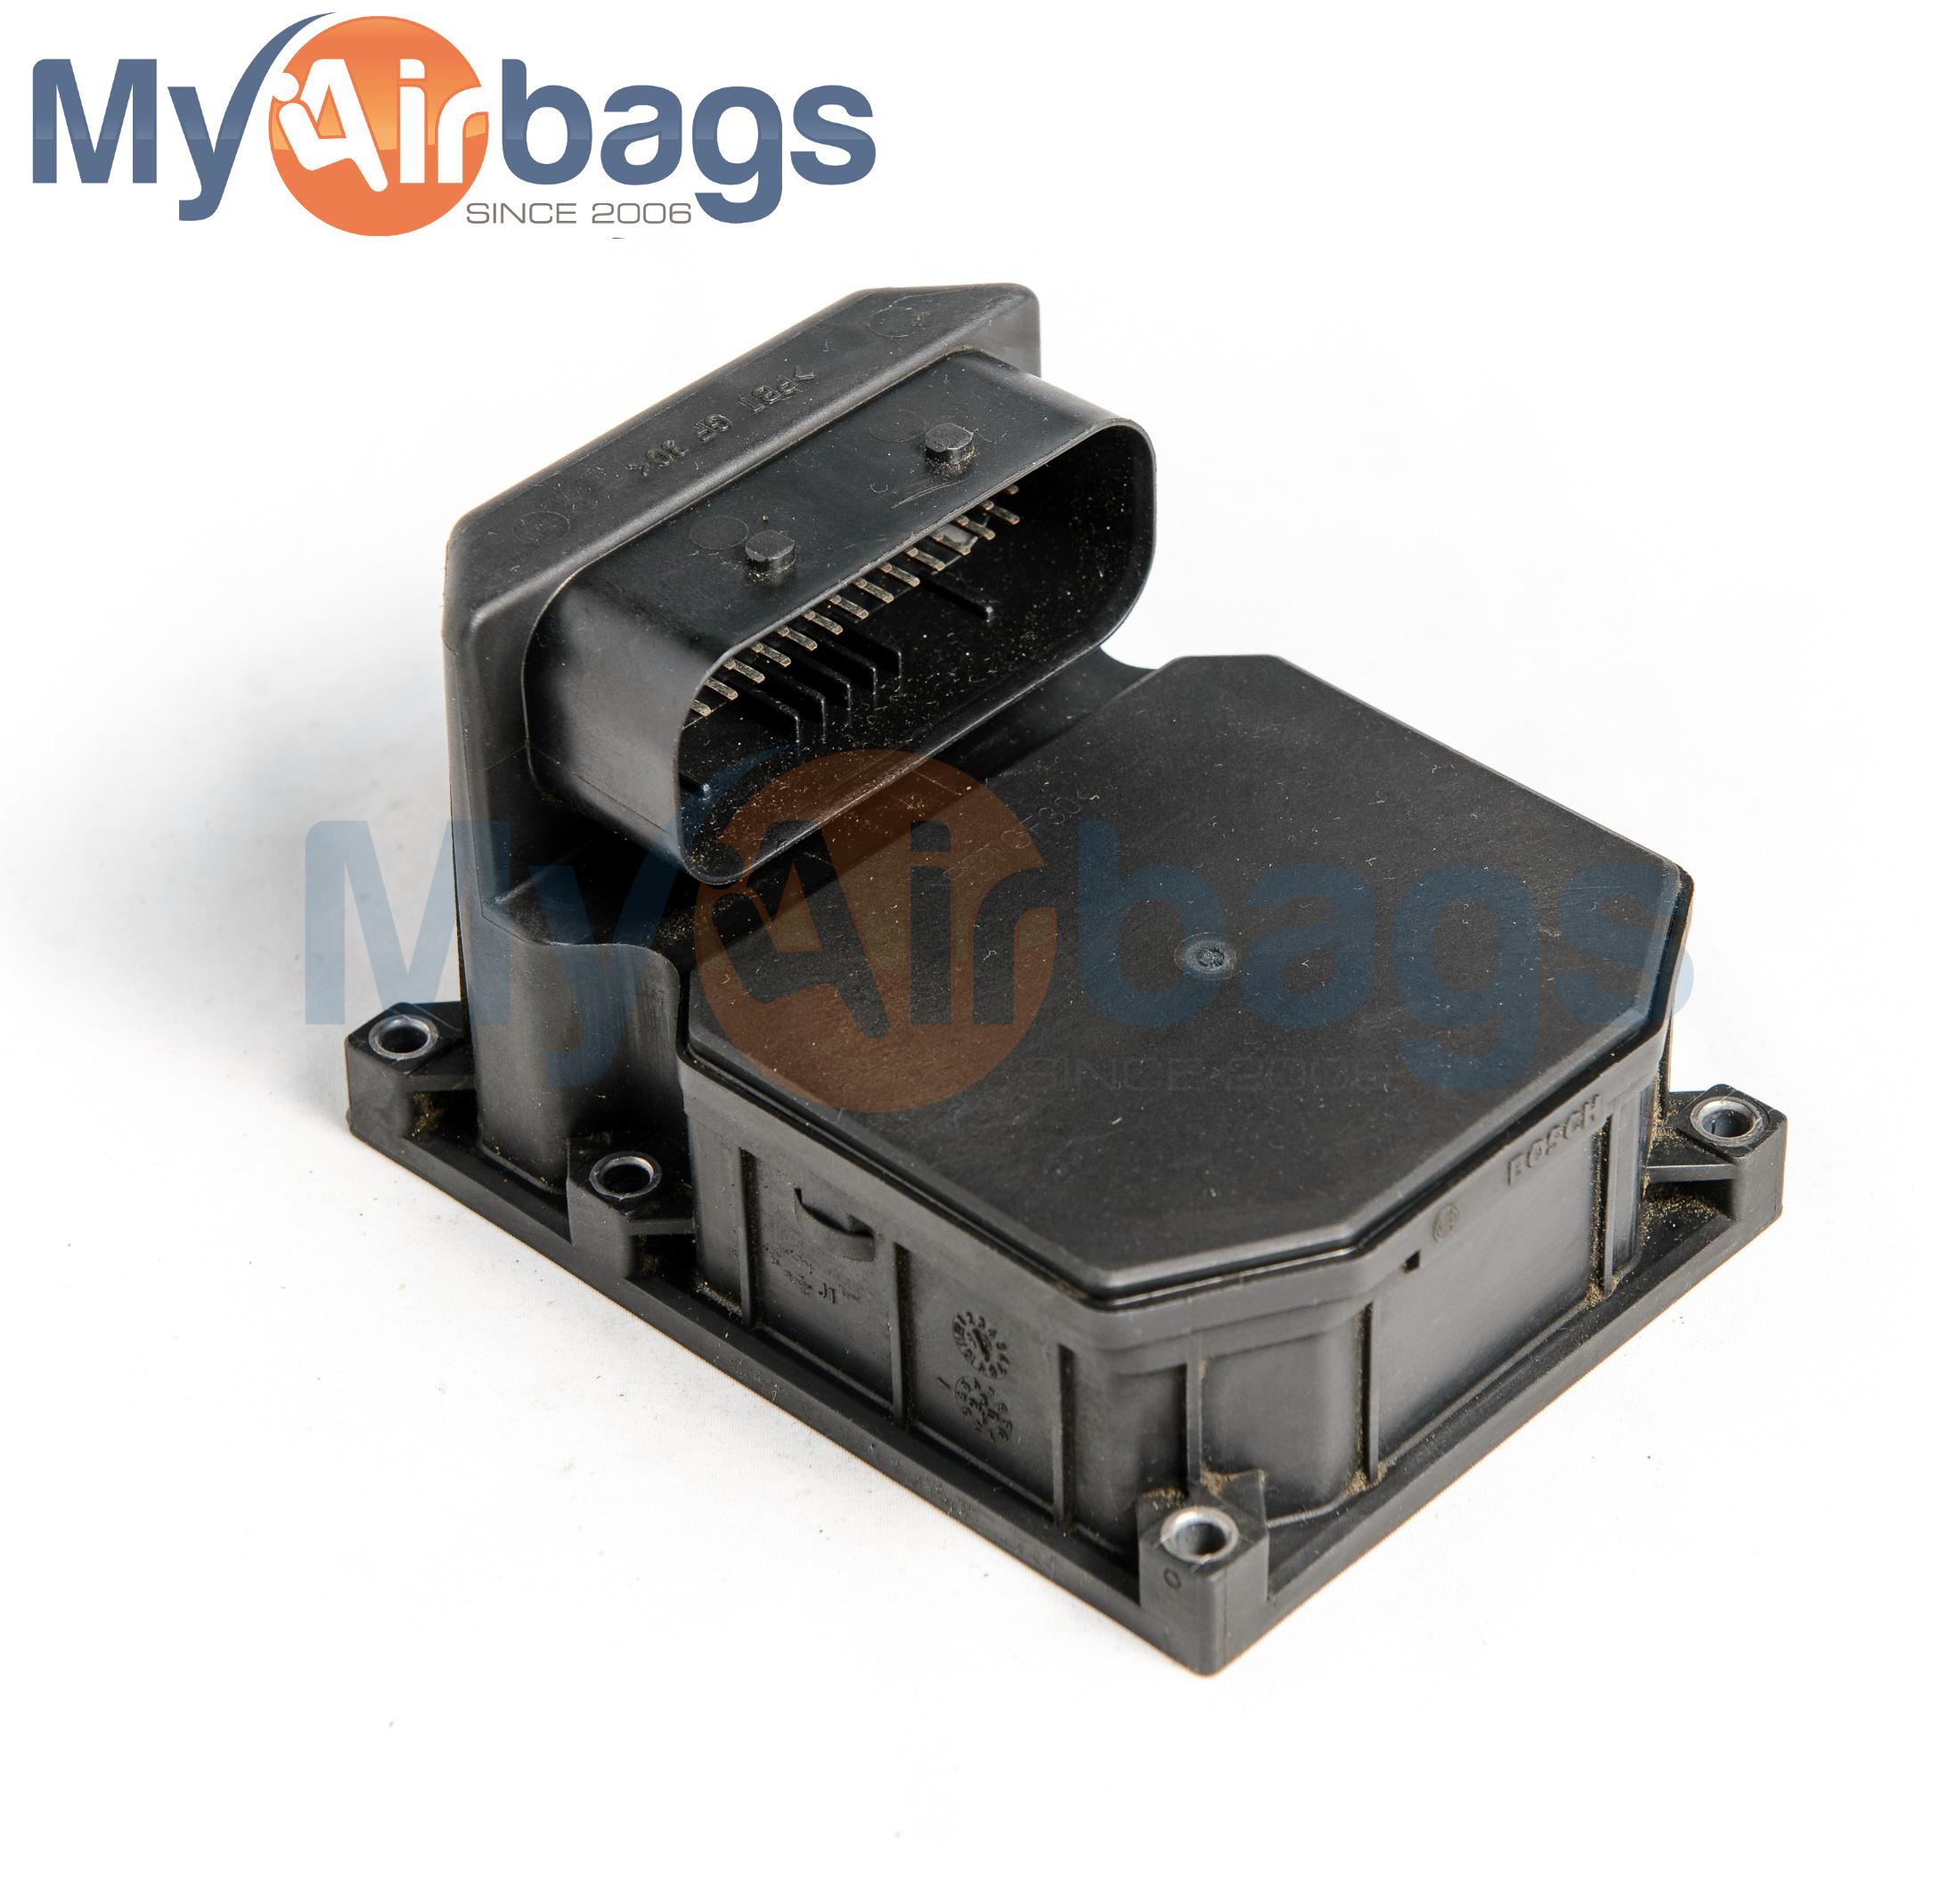 MyAirbags-ABS-Module-BOSCH-5.7-Img2